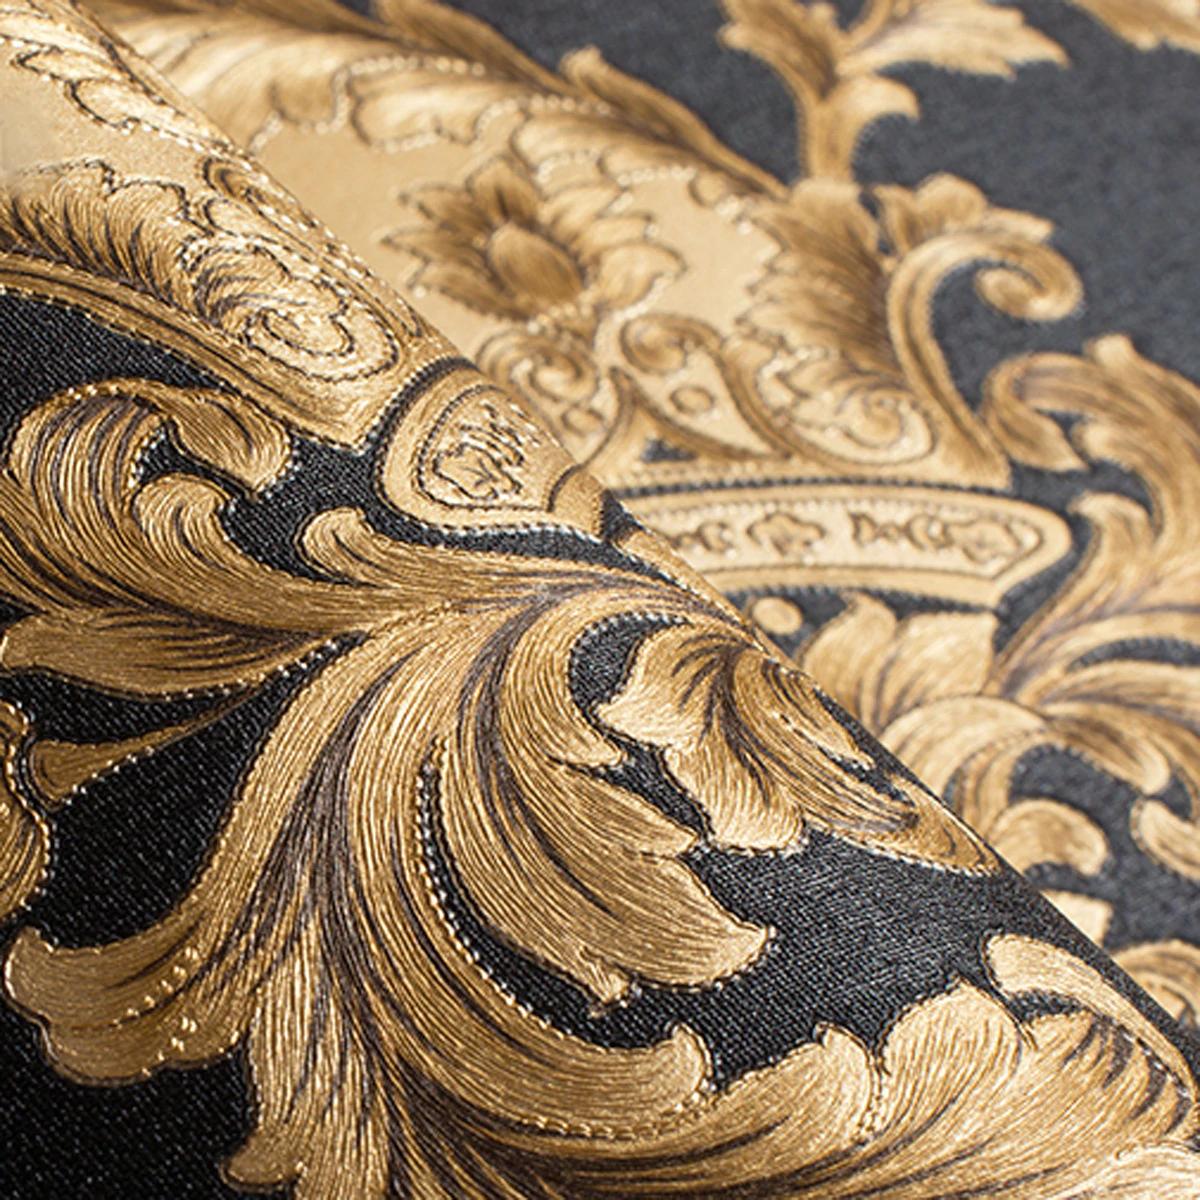 Luxury Embossed Black & Gold Damask Wallpaper Patterned